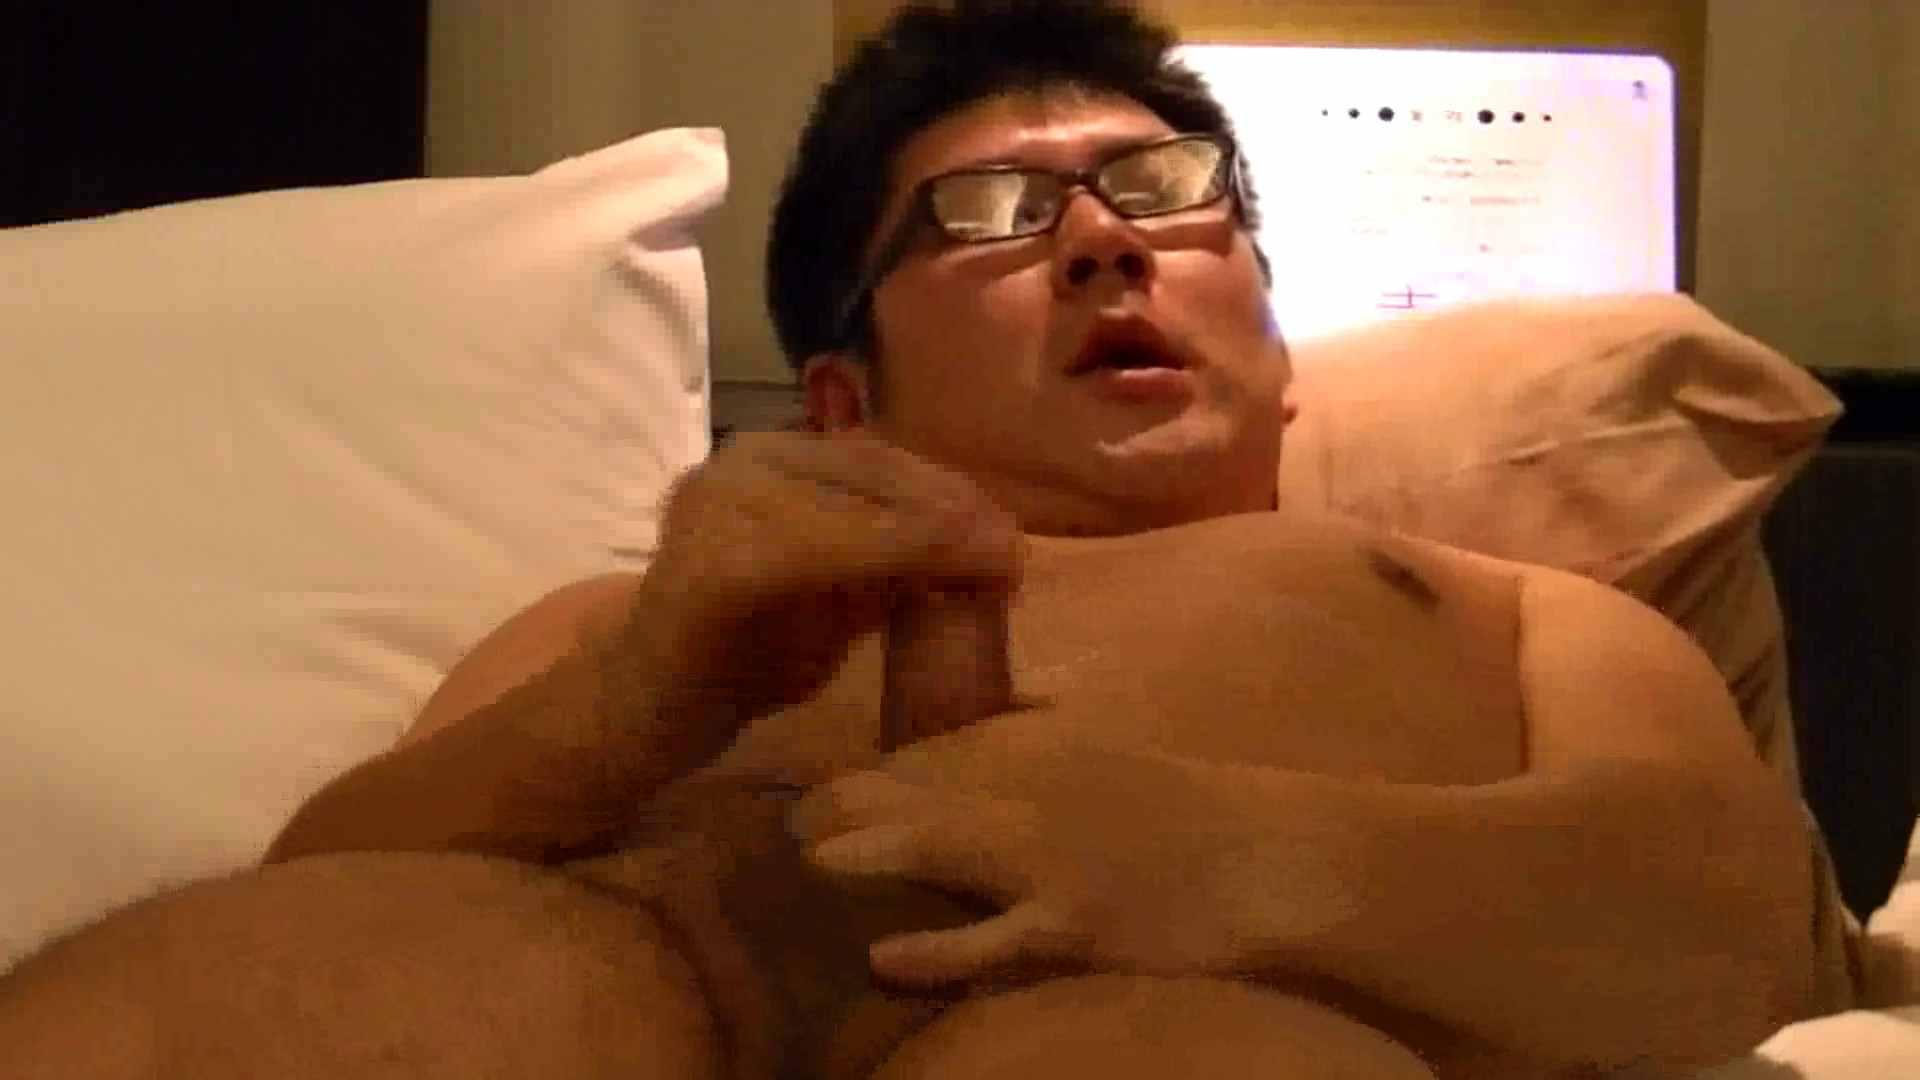 ONA見せカーニバル!! Vol5 エッチ ゲイ無修正ビデオ画像 108枚 8